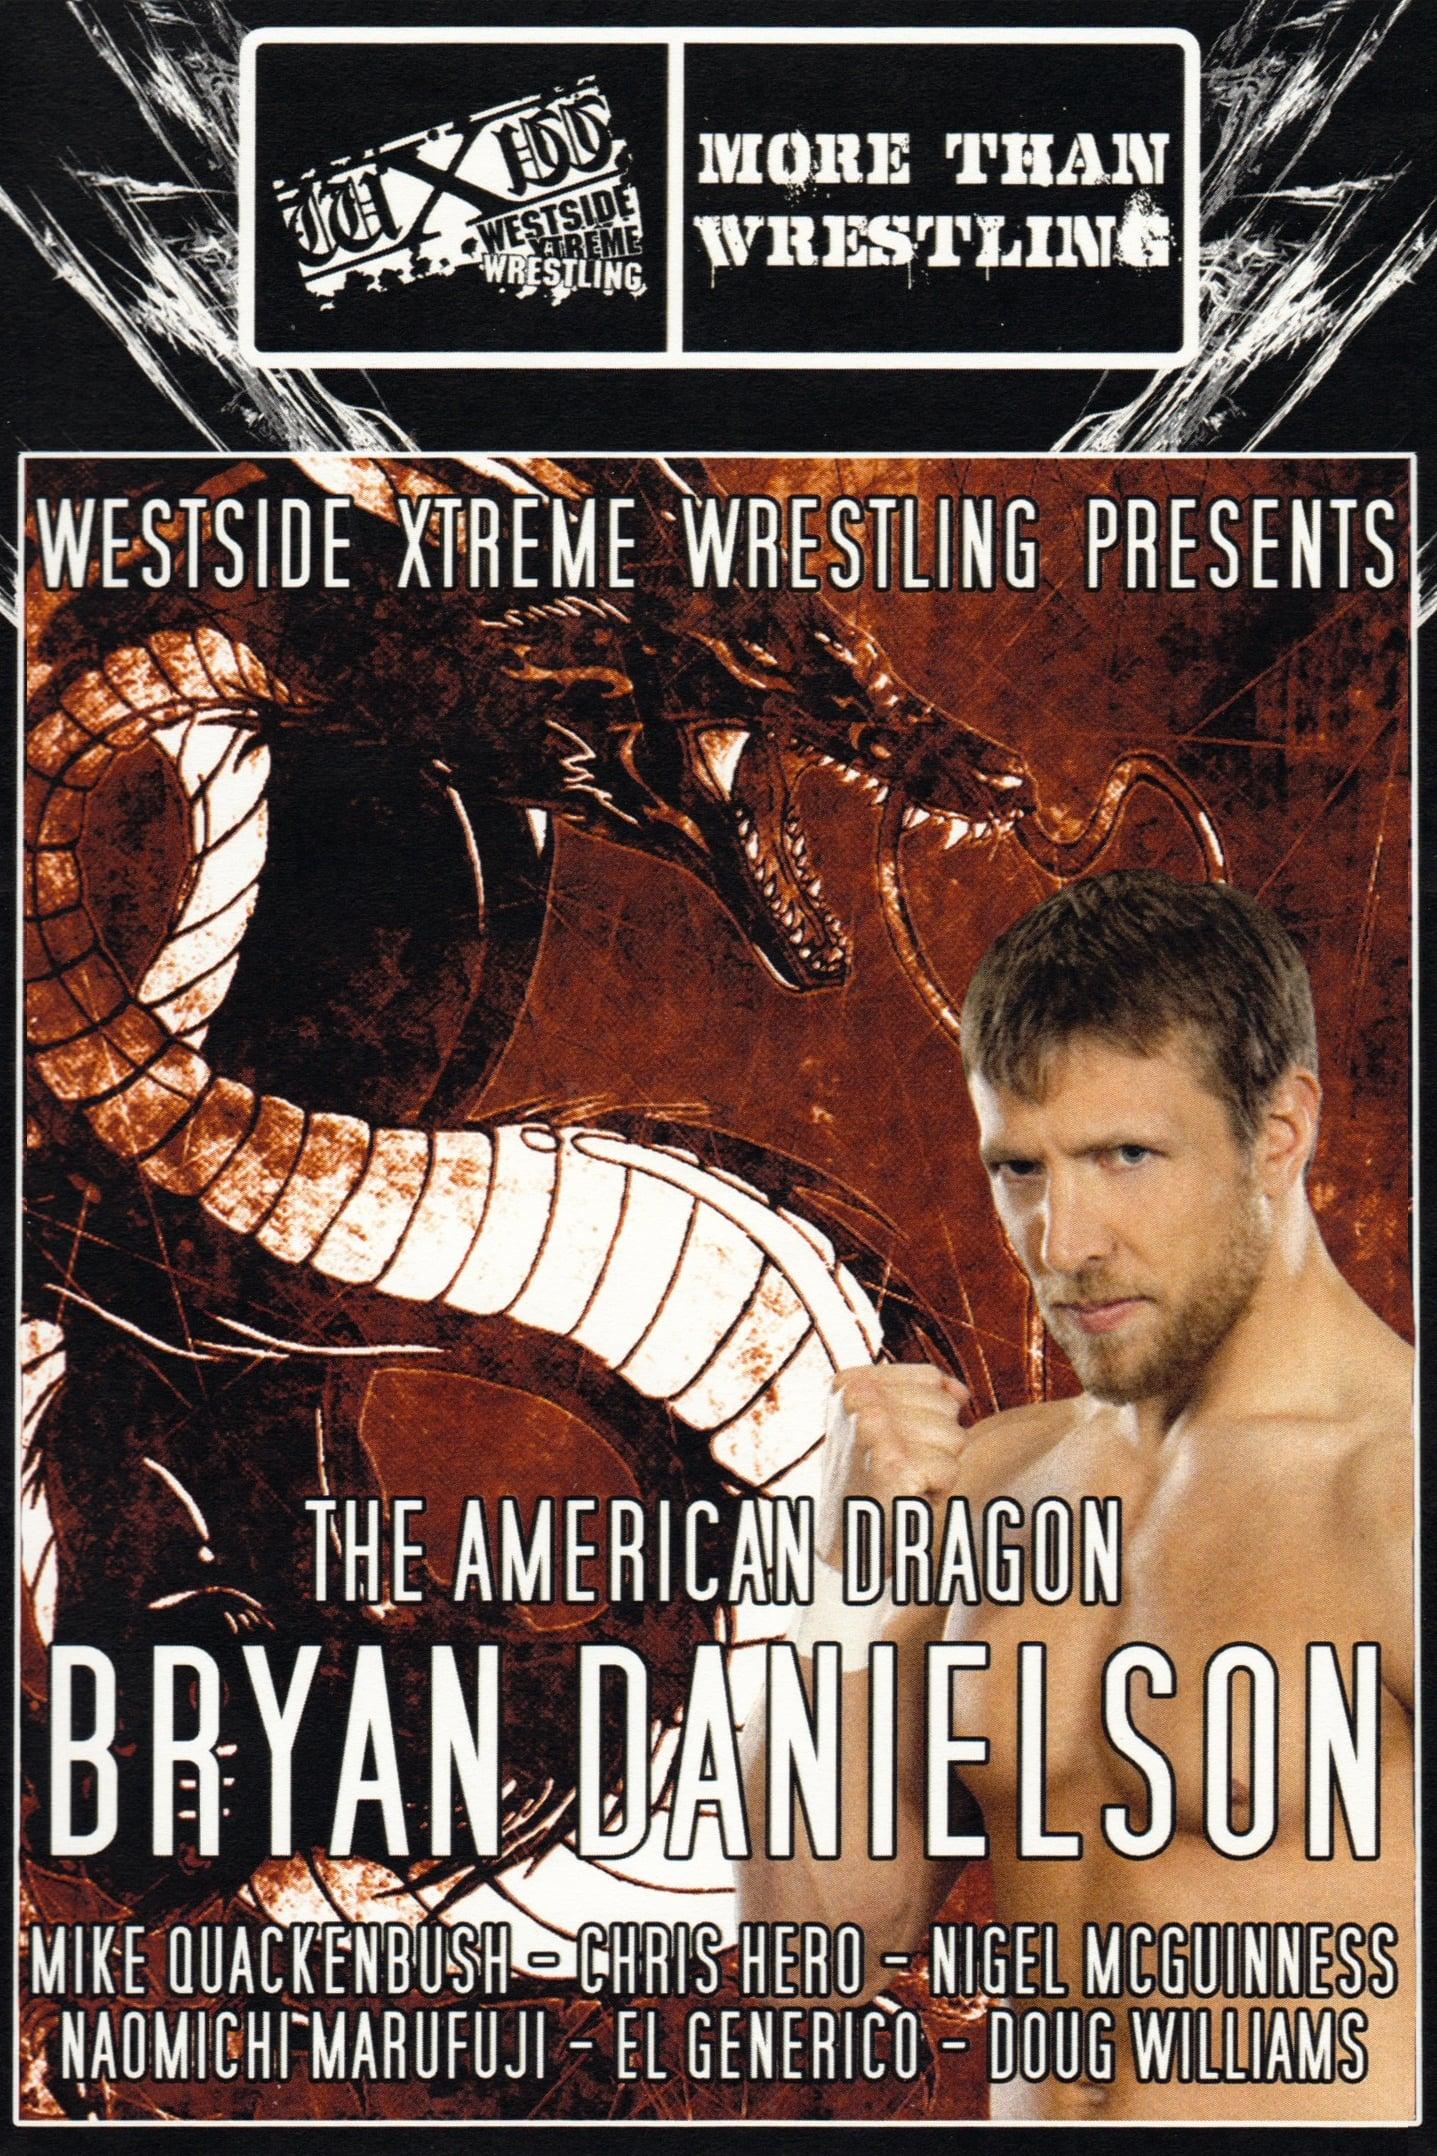 WXW Presents: The American Dragon Bryan Danielson